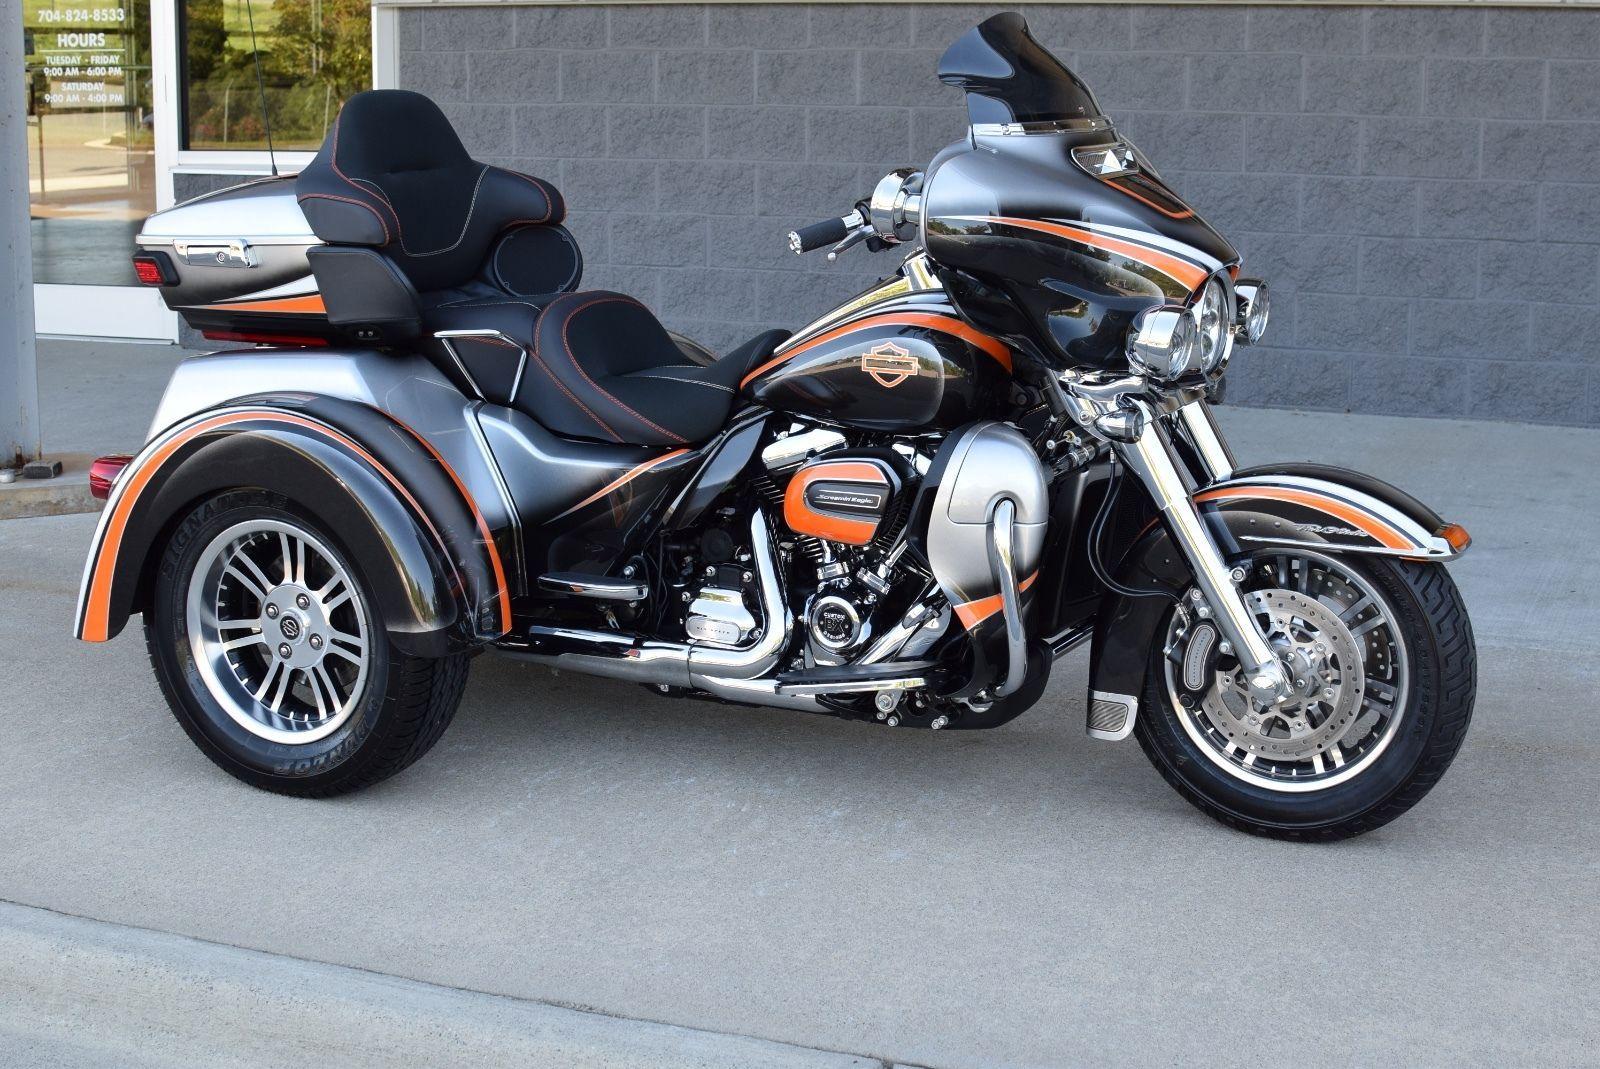 2017 Harley Davidson Tri Glide Trike Custom Flawless Retail Price 50 000 38 580 Sale Price 41 808 32 263 Harley Bikes Harley Harley Davidson Glide